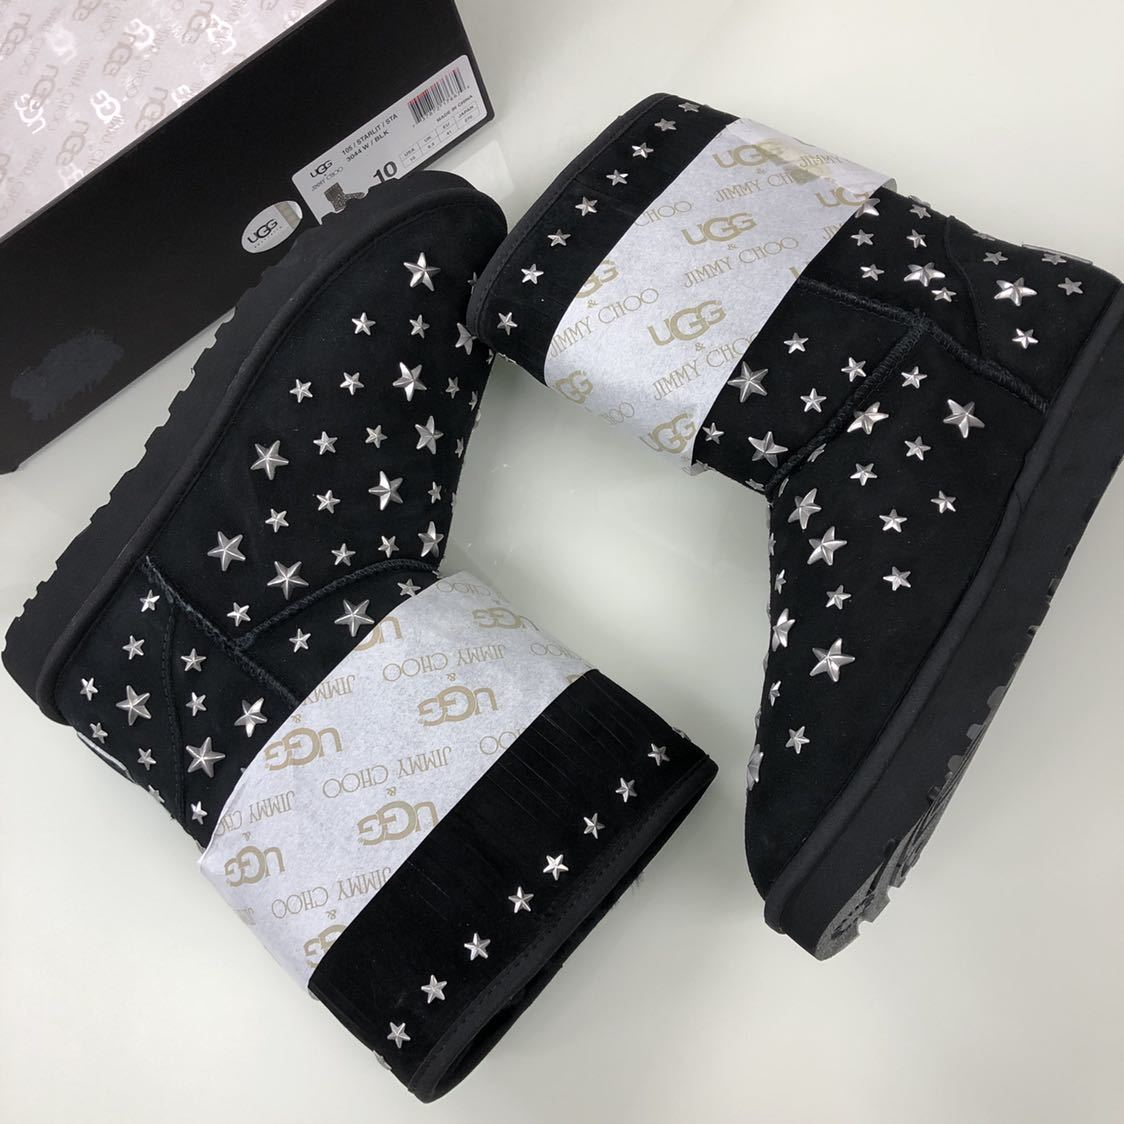 fb474f6ab06 wonderful collaboration new goods ( men's size )JIMMY CHOO×UGG( Jimmy Choo  UGG ) fringe Star studs mouton boots black ( size W10)27cm